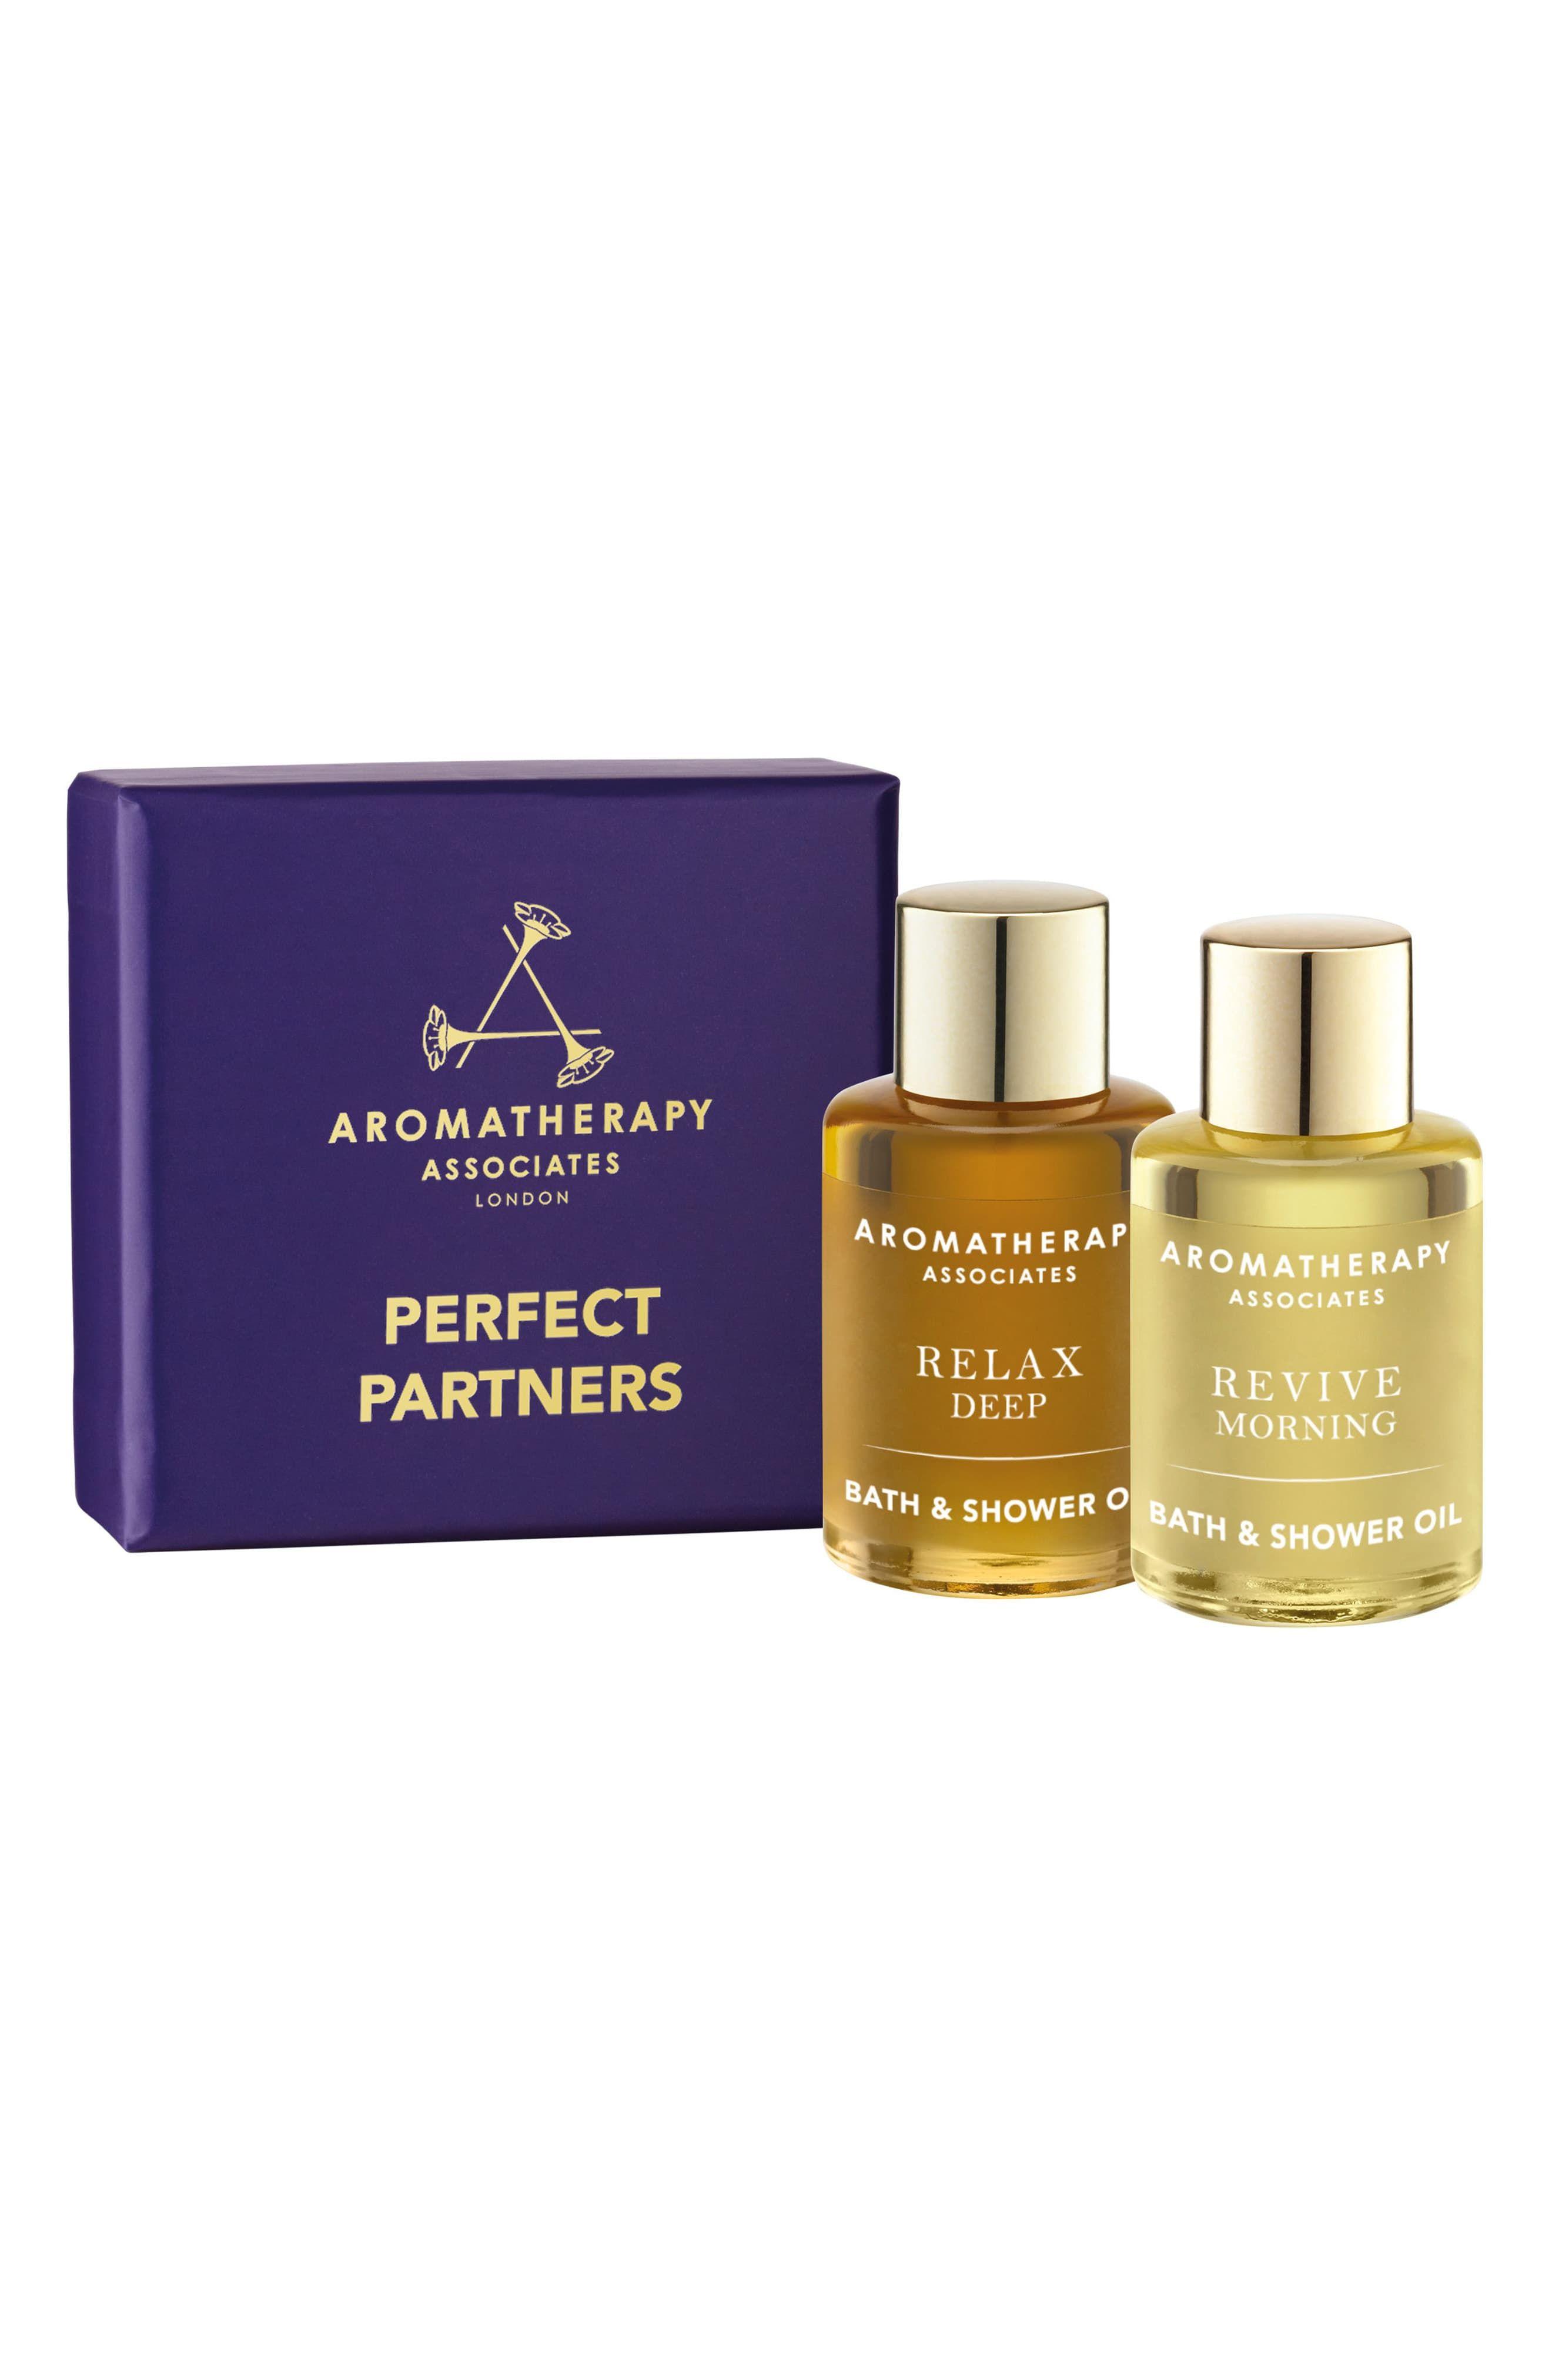 Aromatherapy Associates Perfect Partners Bath & Shower Oil